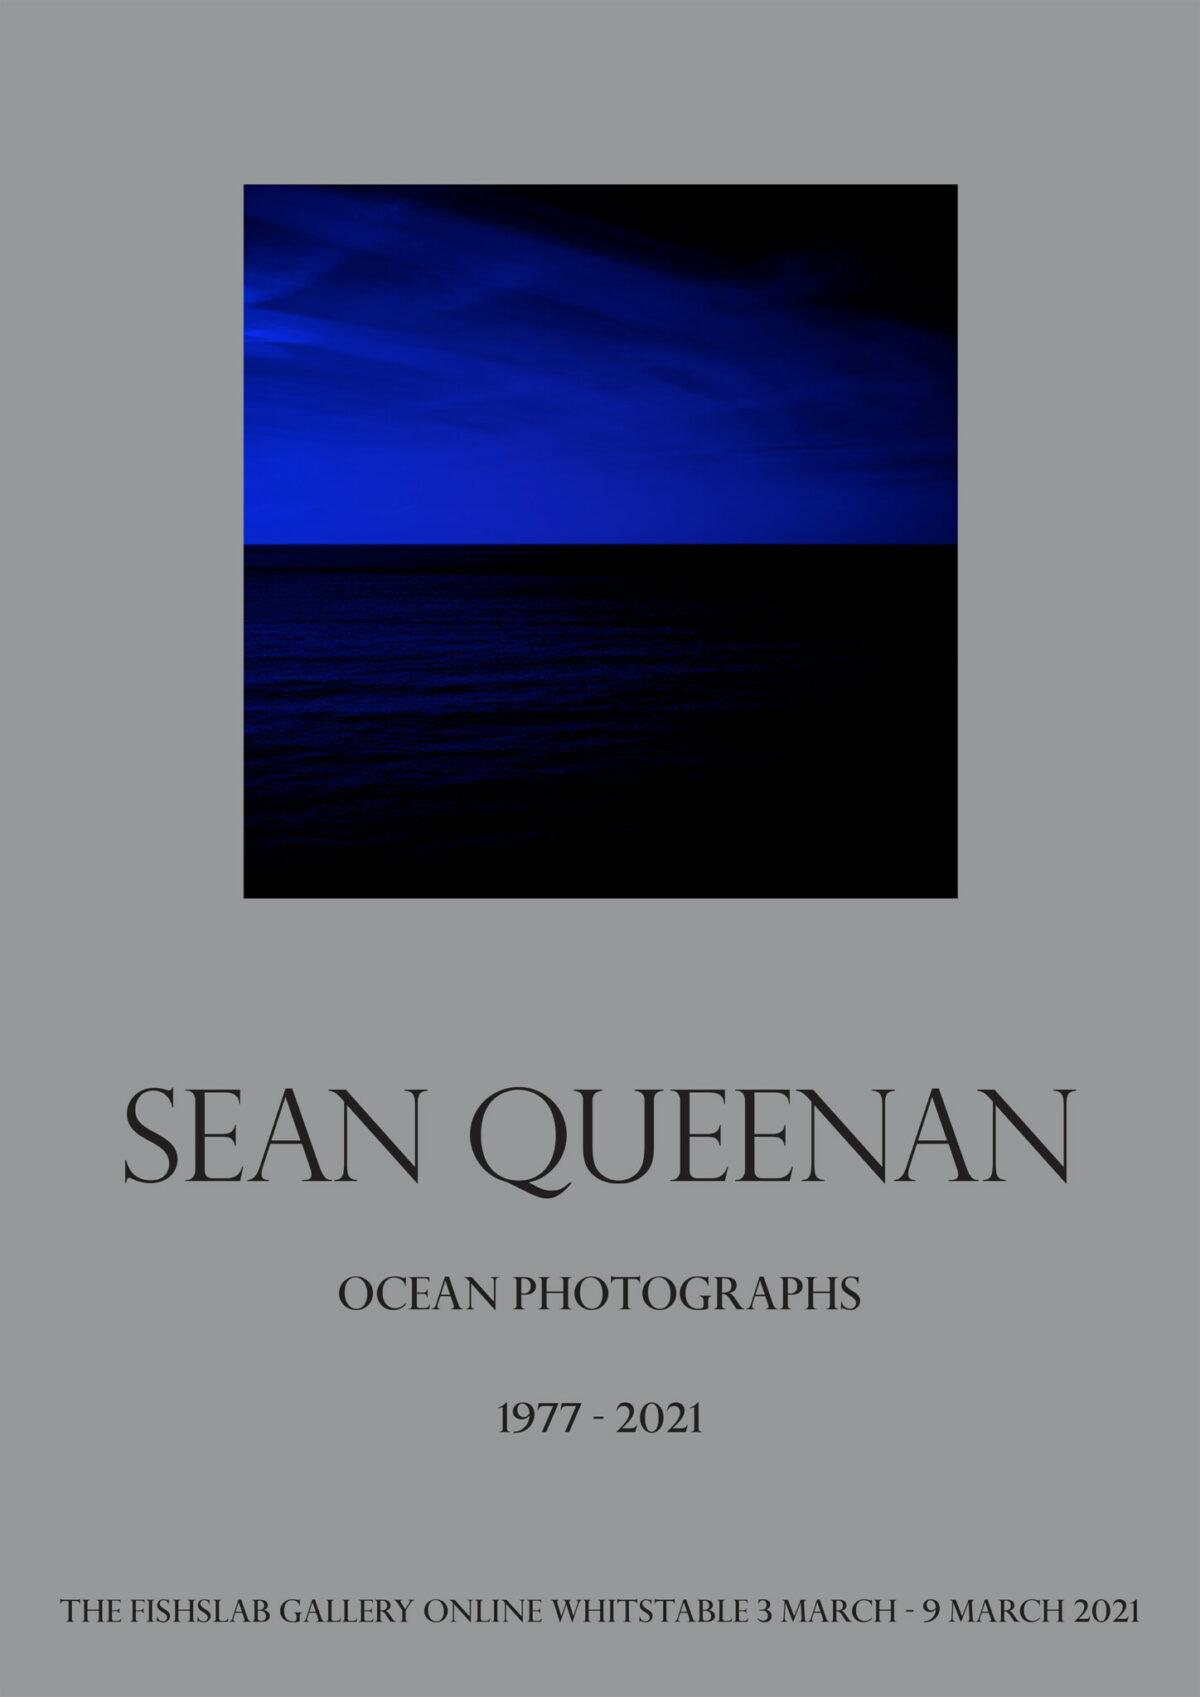 Sean Queenan Exhibition Ocean Photographs